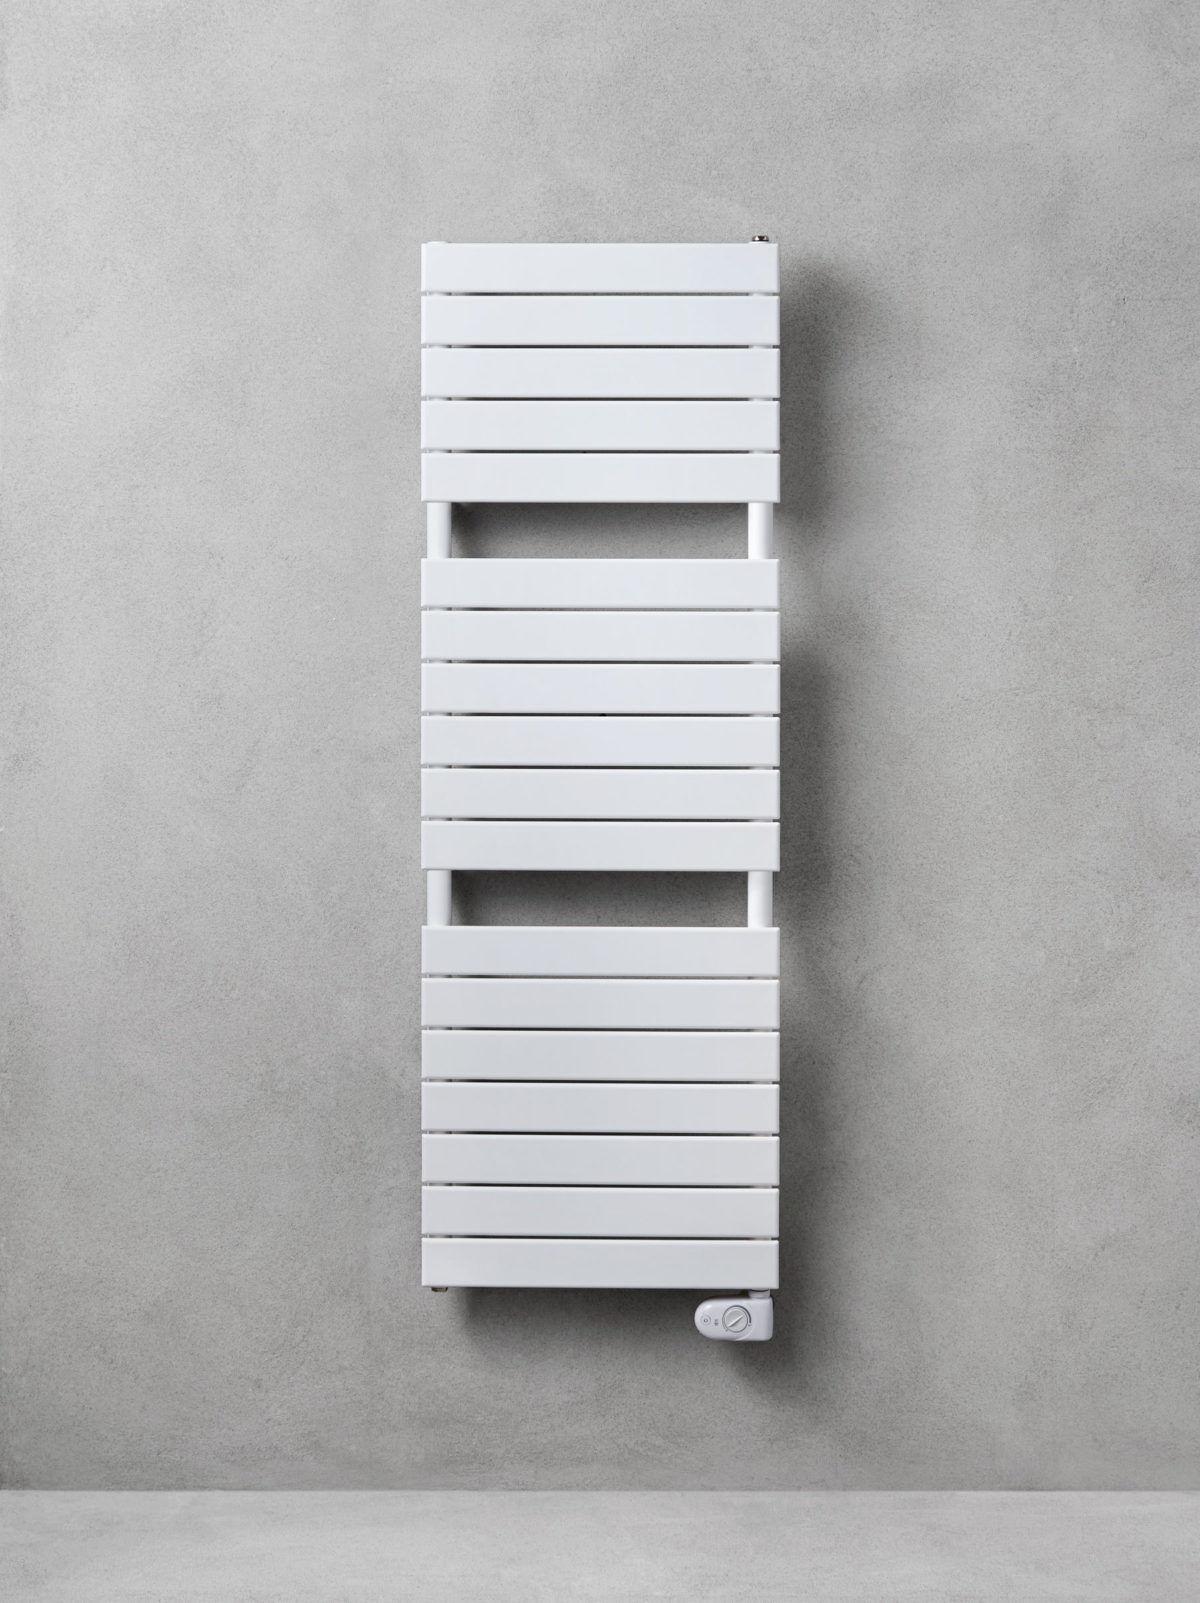 Rad scaldasalviette elettrico gufo bianco 826x510 bagno idraulica shop - Bagno idraulica shop ...